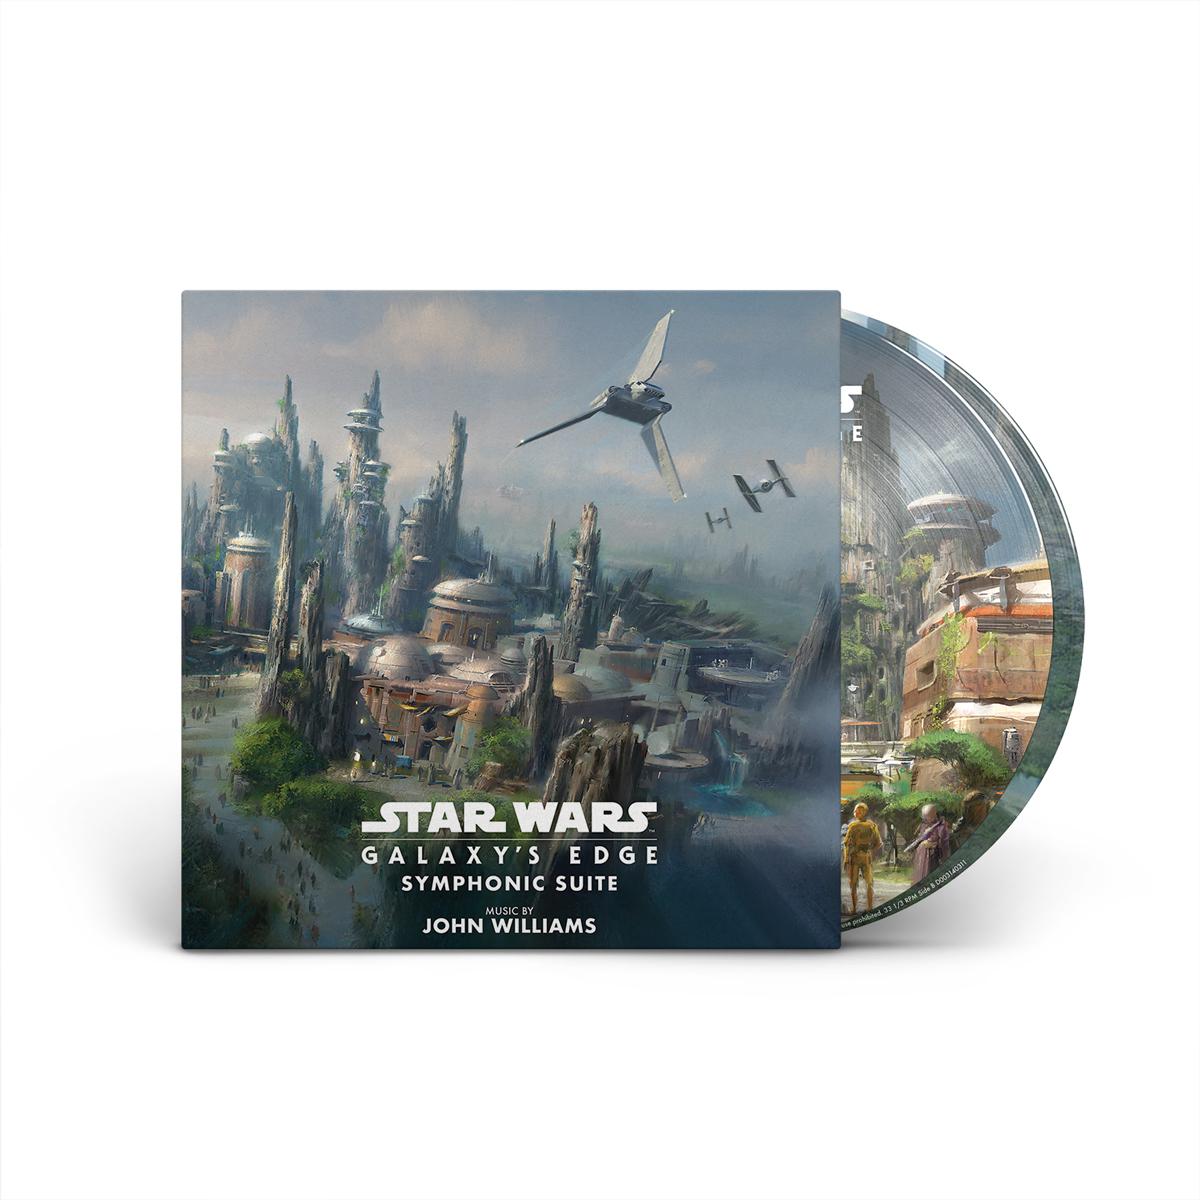 Star Wars: Galaxy's Edge Symphonic Suite